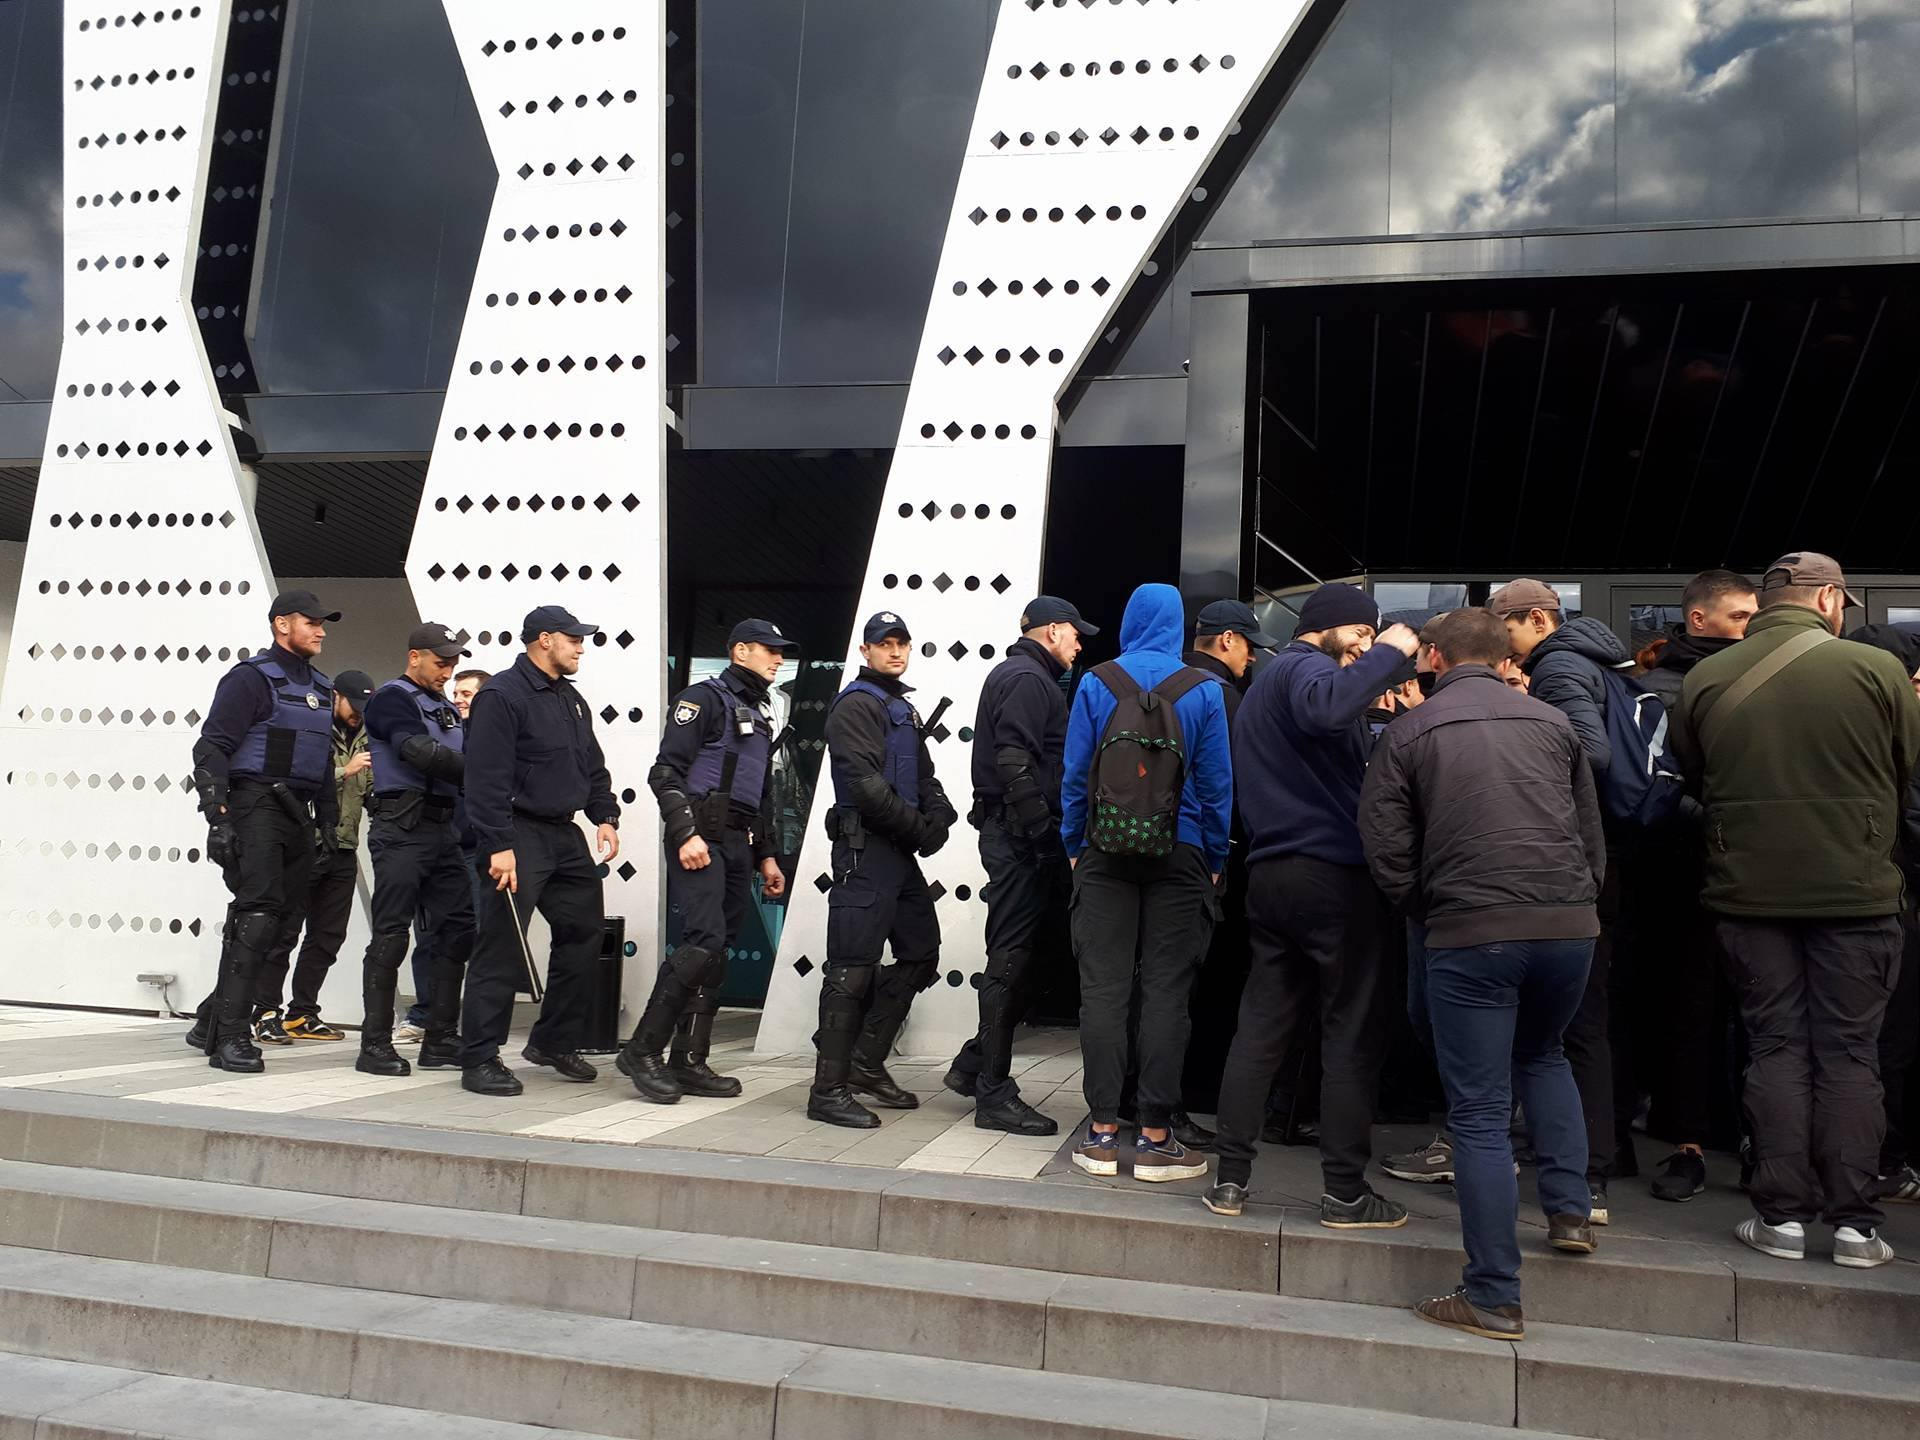 ВоЛьвове протестующие сорвали концерт певца Сергея Бабкина